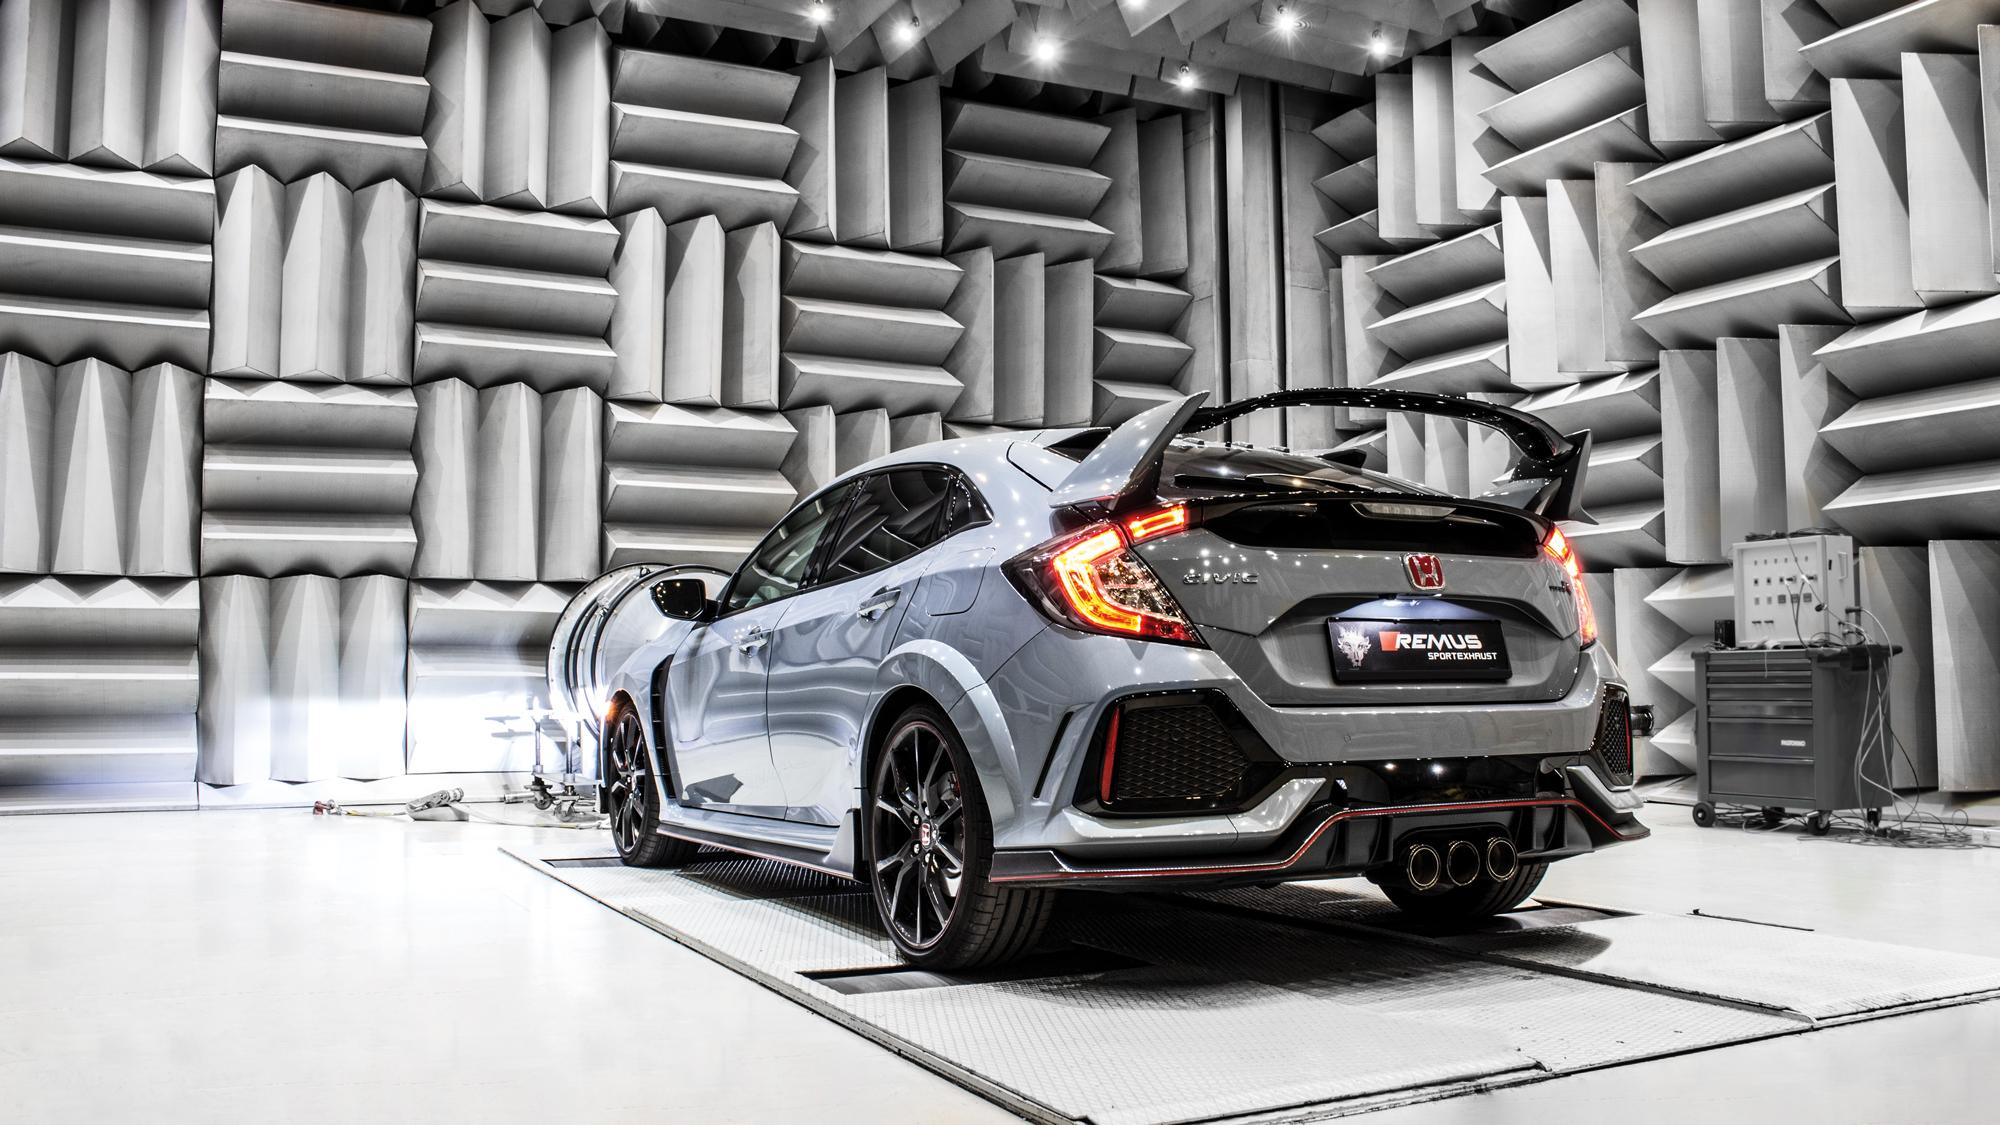 REMUS product information 04-2018 HONDA Civic Type R